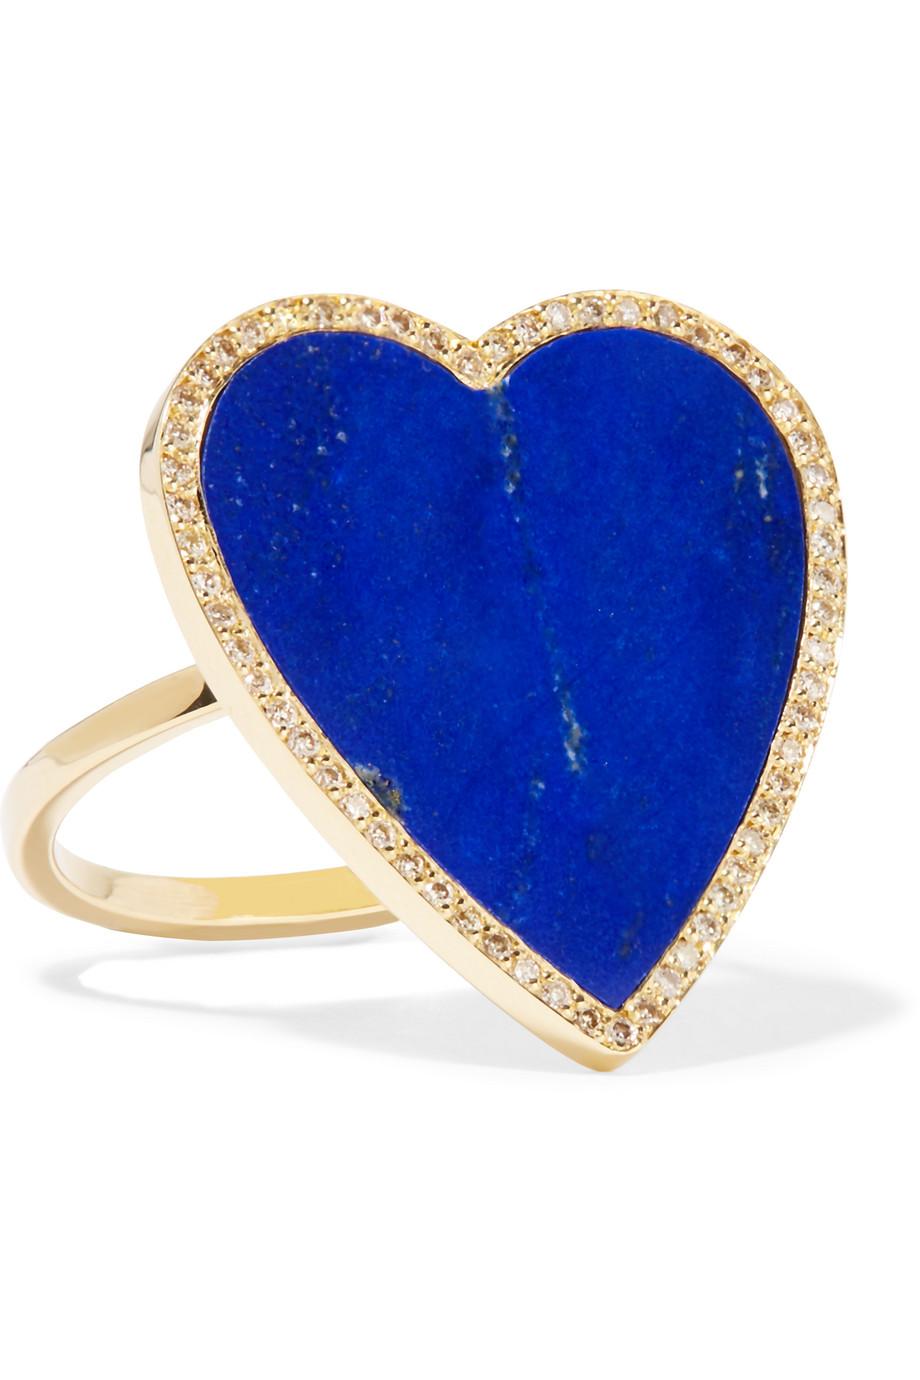 Jennifer Meyer 18-Karat Gold, Lapis Lazuli and Diamond Heart Ring, Gold/Blue, Women's, Size: 6 3/4